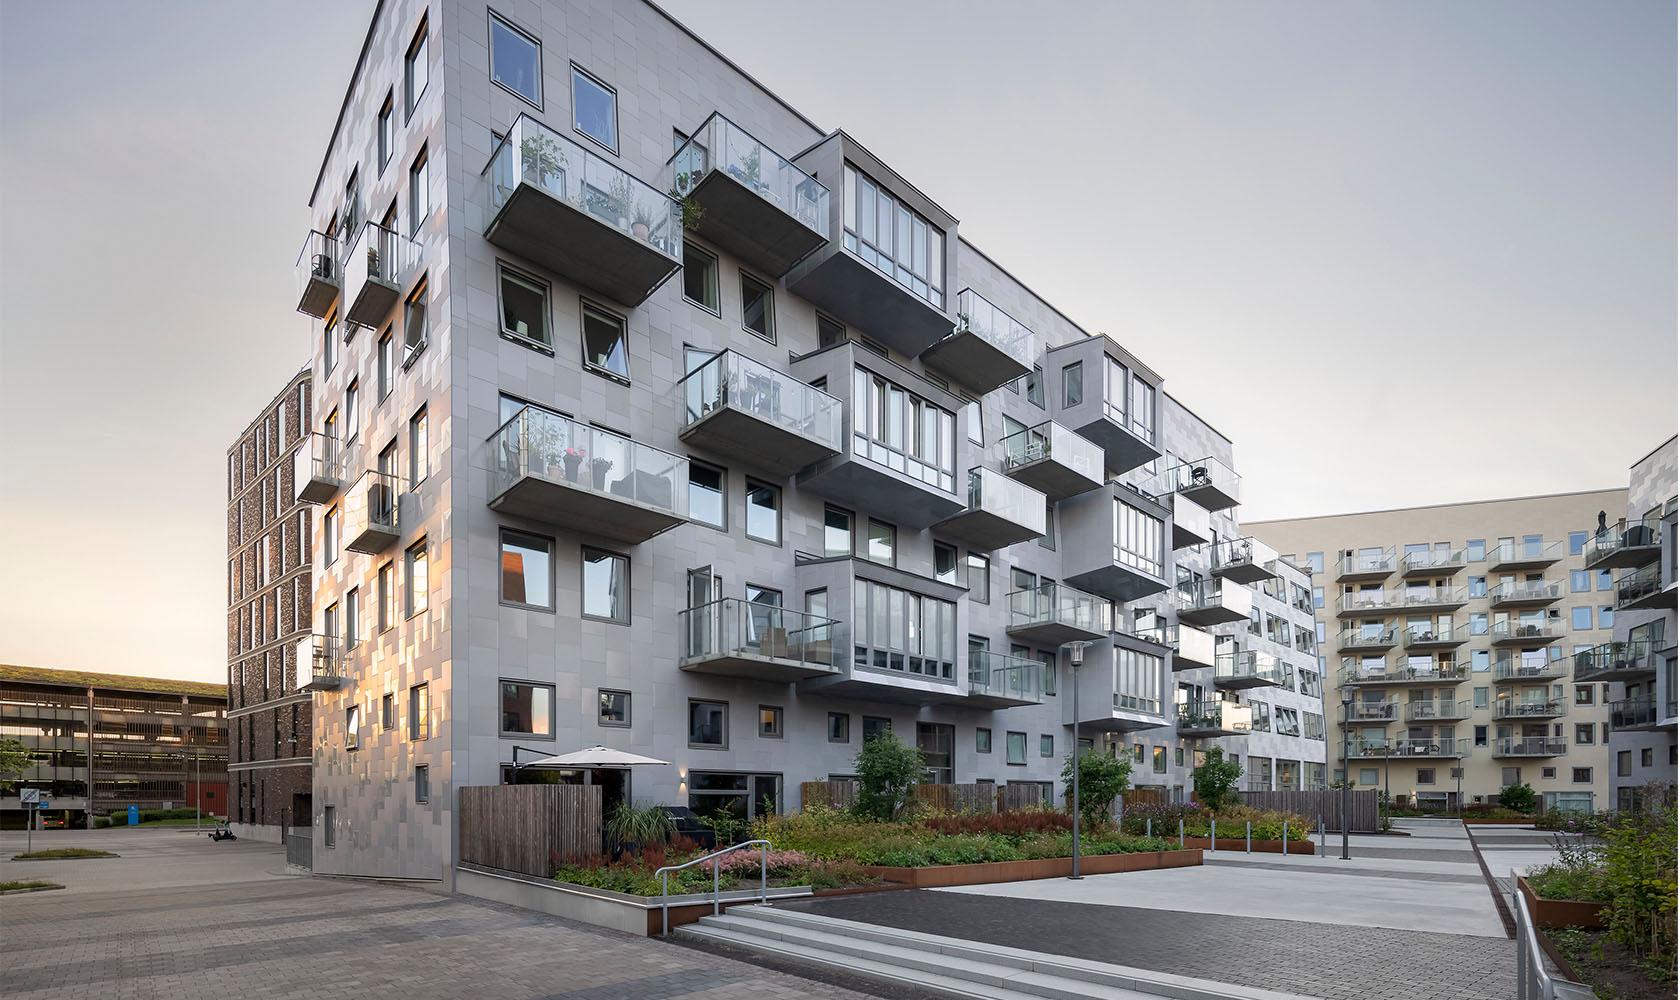 Bostadshus Lindholmshamnen Göteborg